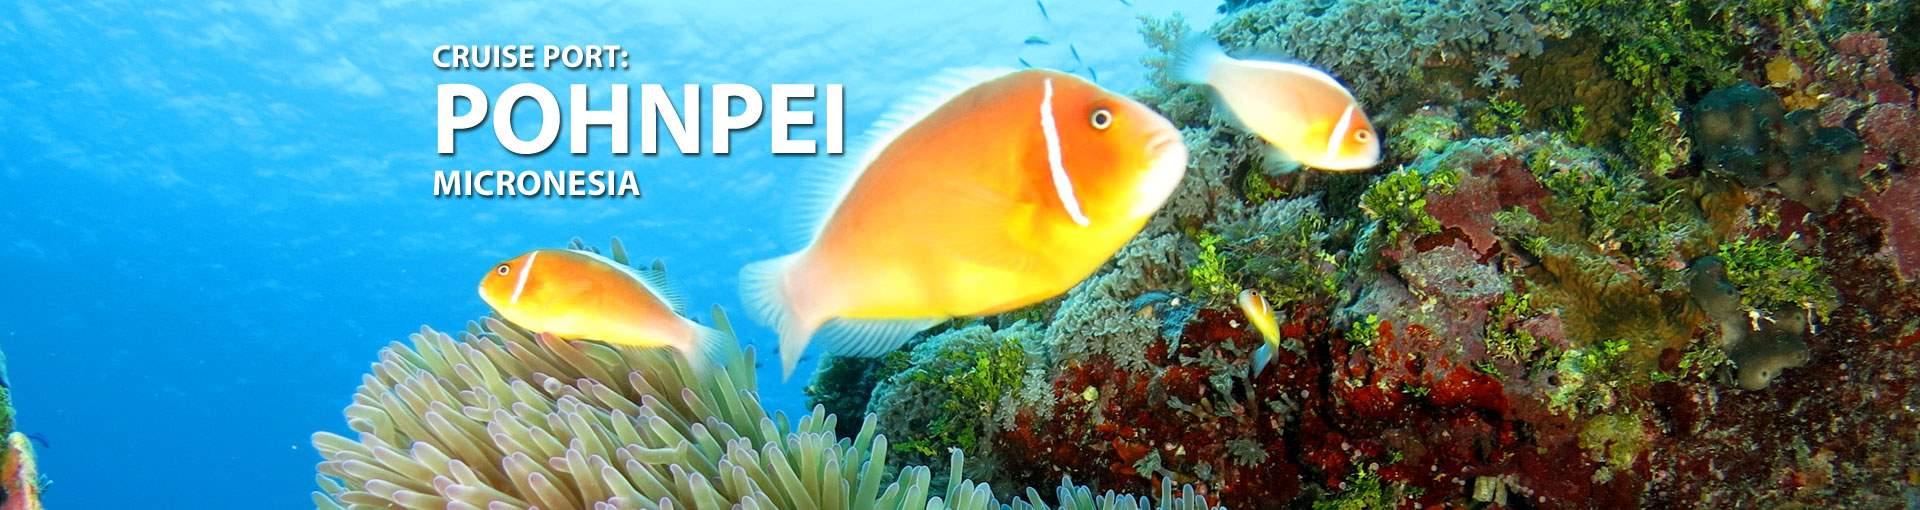 Cruises to Pohnpei, Micronesia